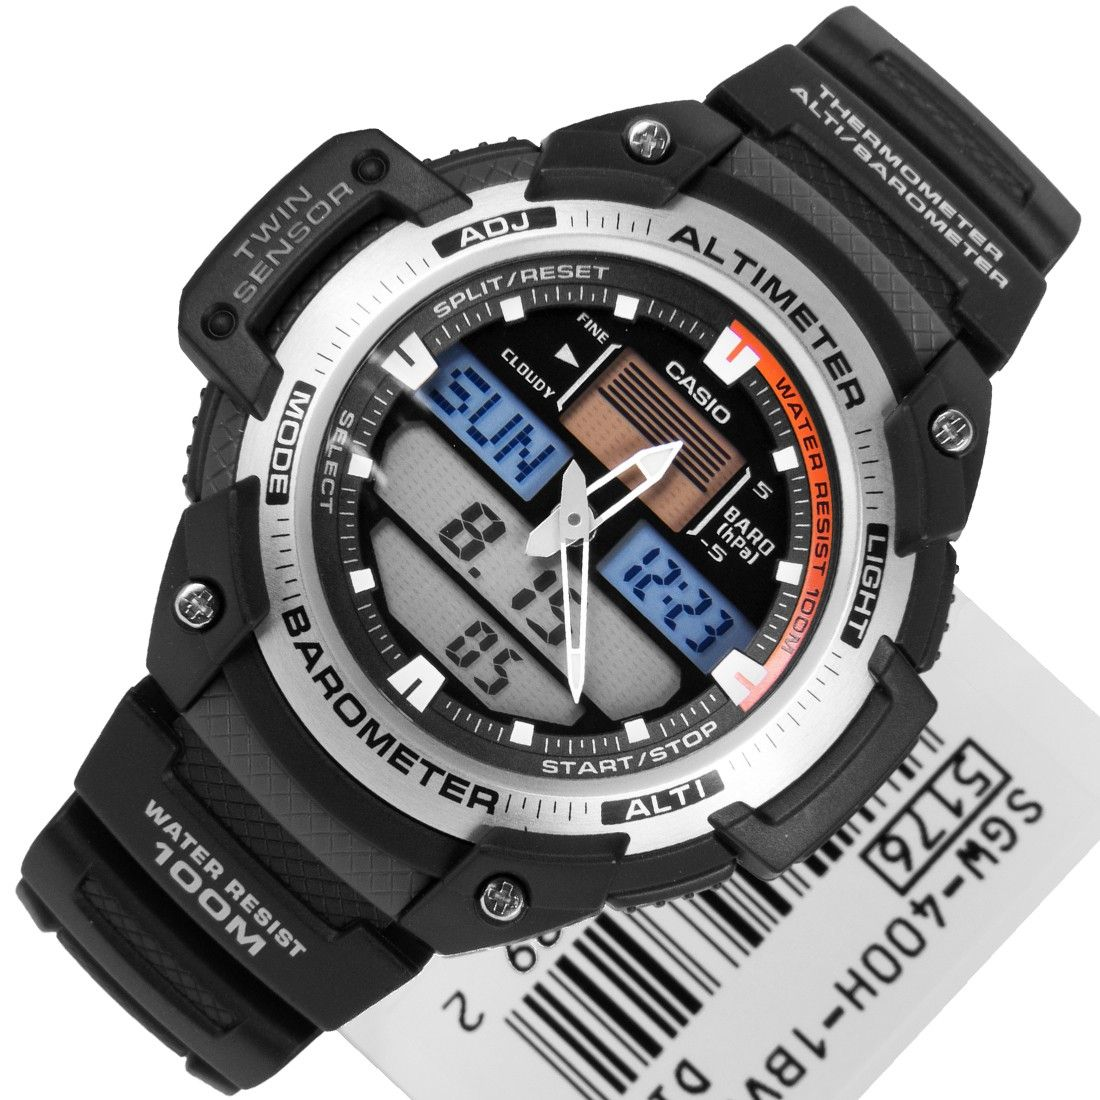 fa729317f89 Relógio Casio OutGear SGW-400H com Barômetro e Altímetro - MGPesca